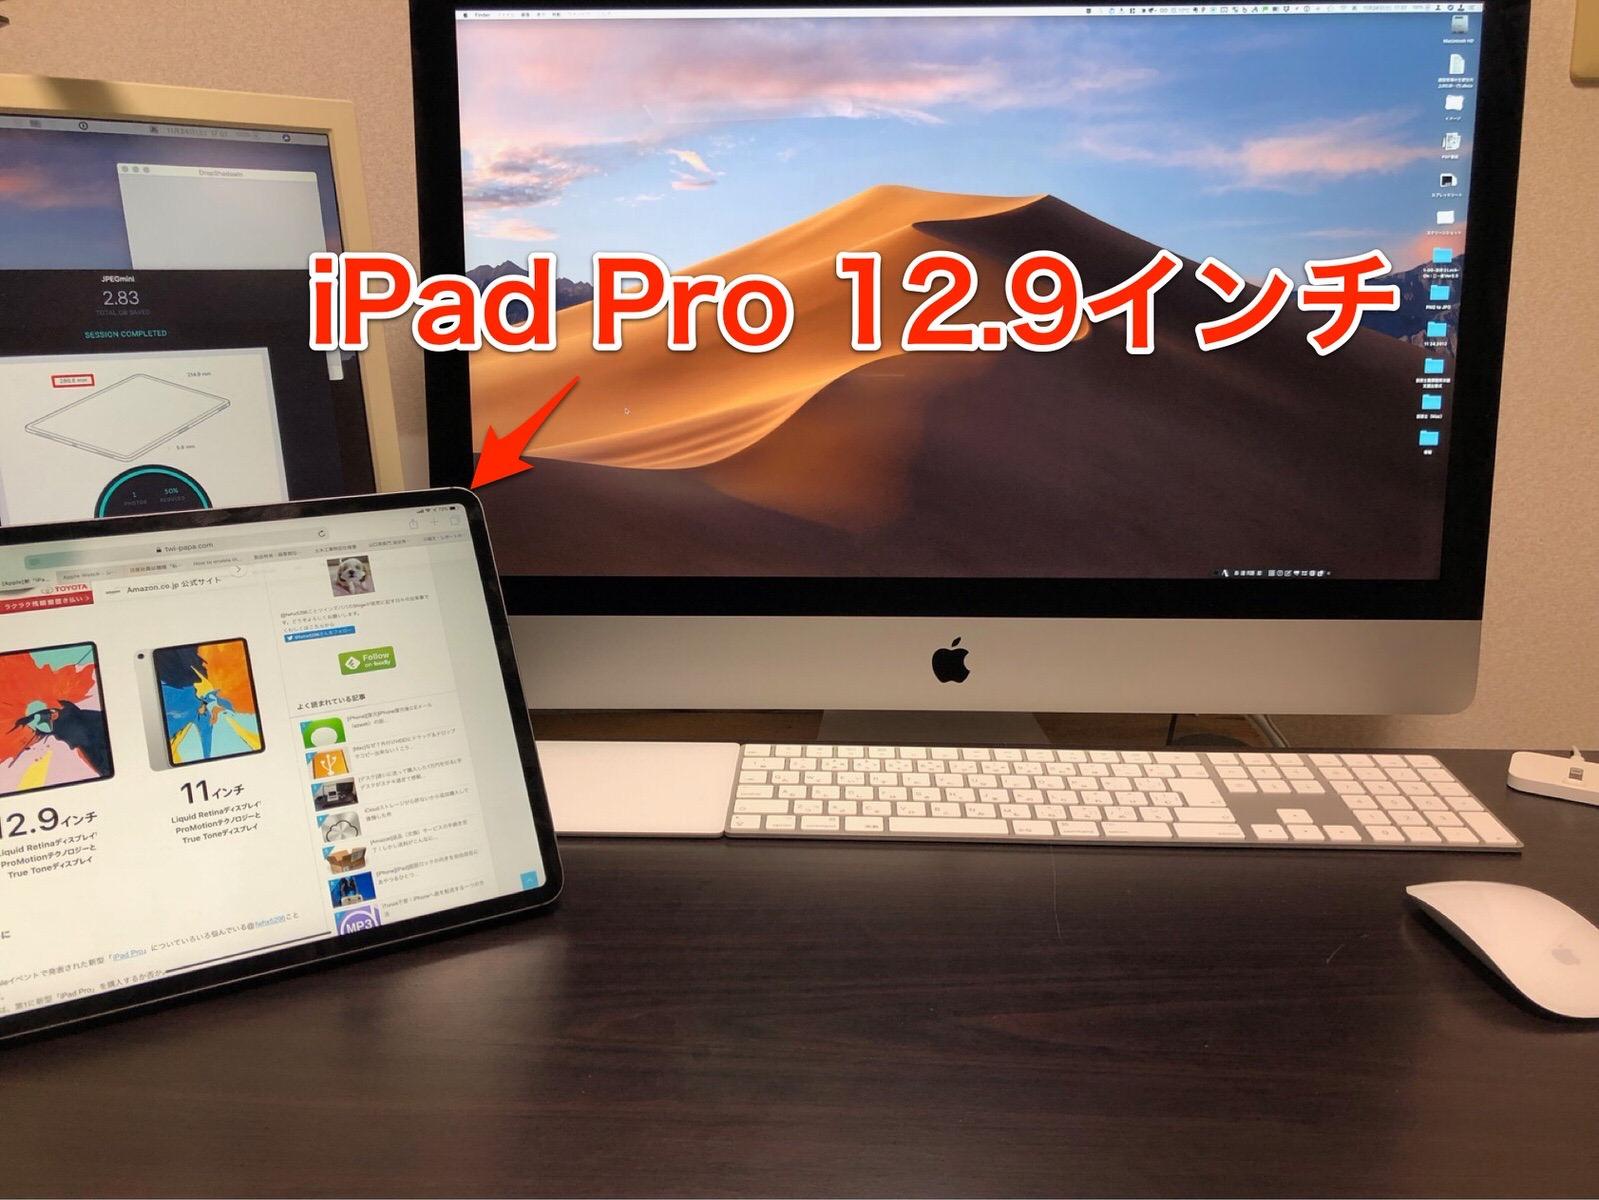 iPad Pro 12.9インチ-1